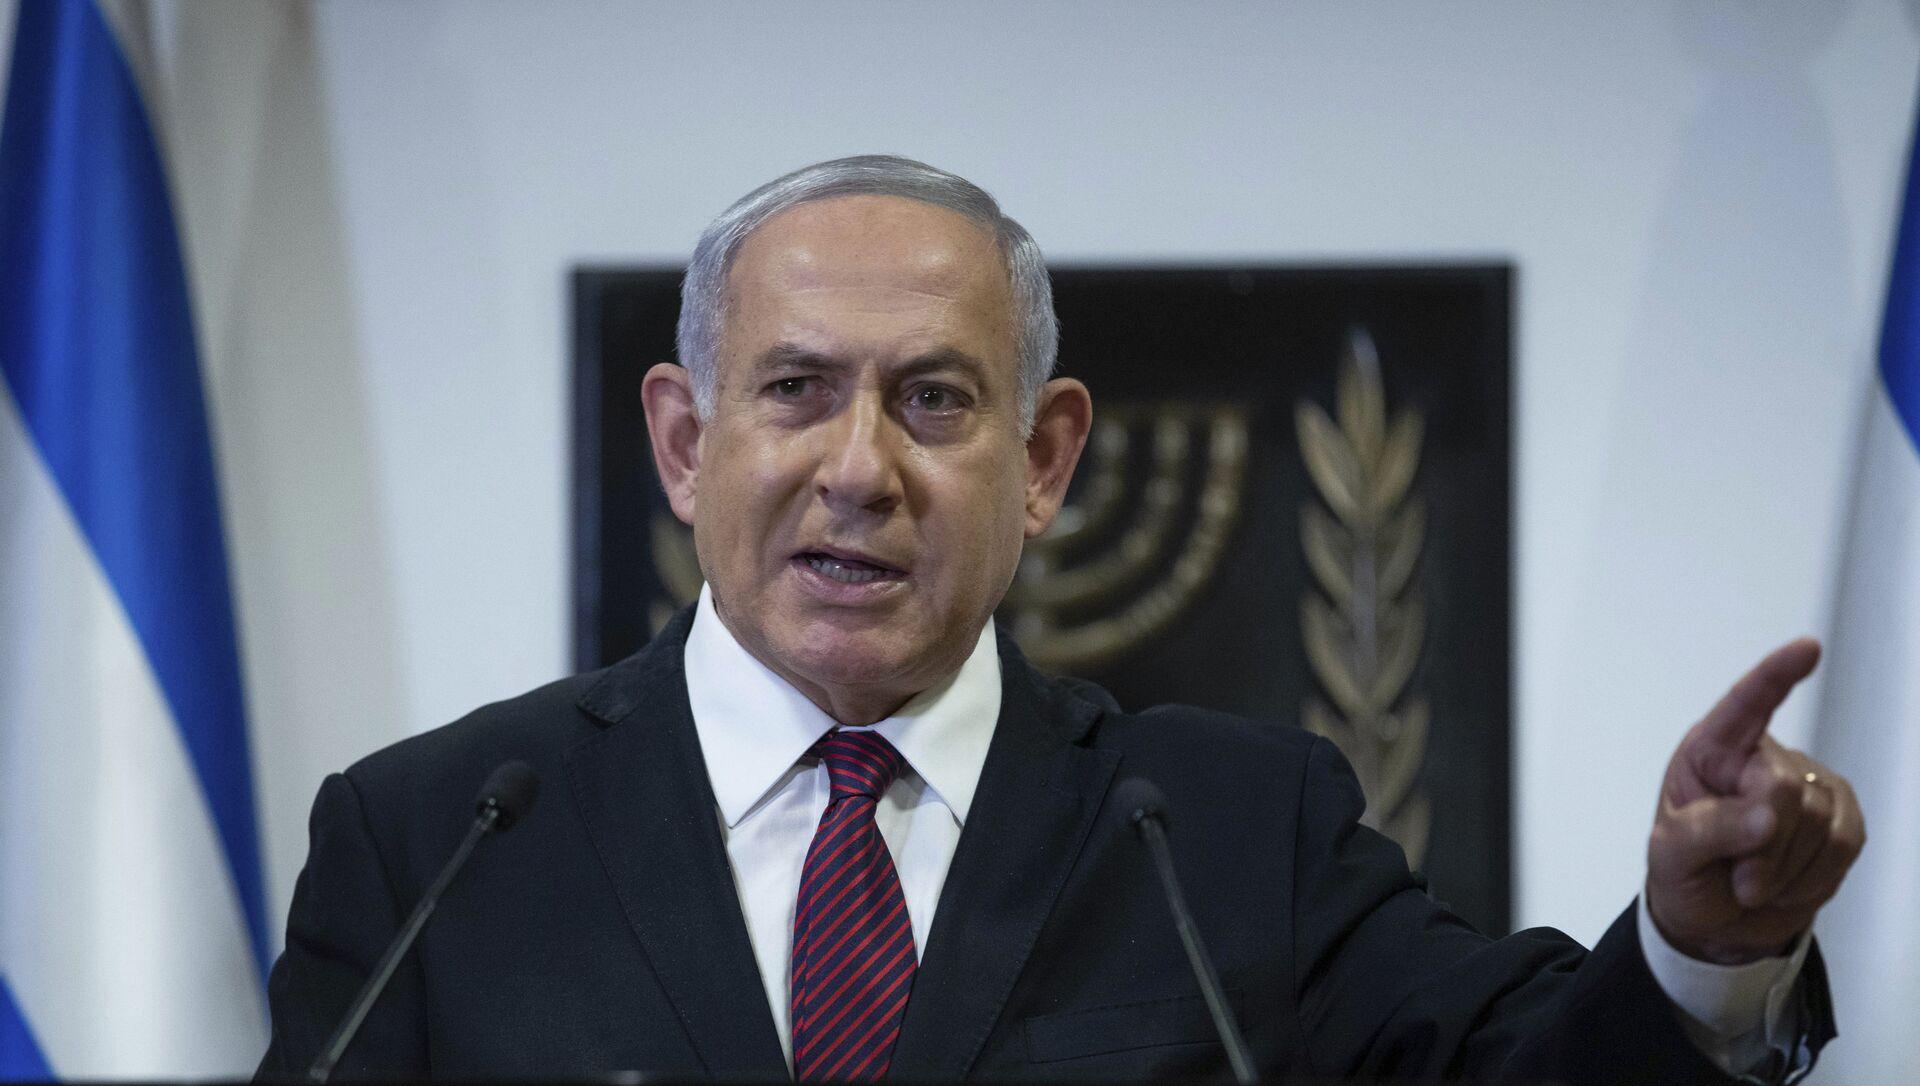 Benjamin Netanyahu, primer ministro israelí - Sputnik Mundo, 1920, 07.02.2021